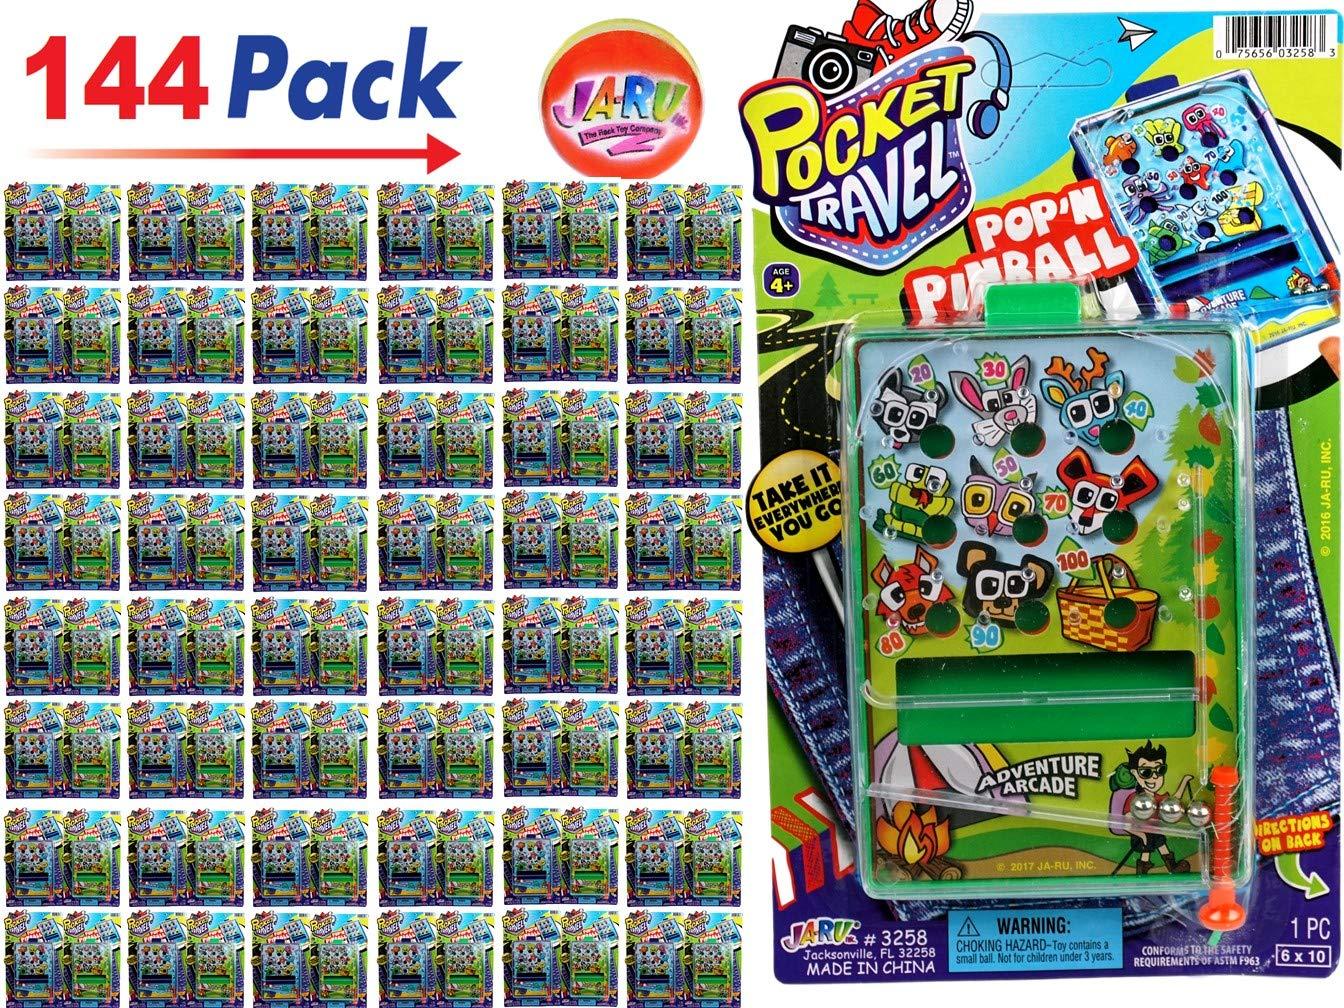 JA-RU Pinball Pocket Travel Game (144 Units) and one Bouncy Ball Item #3258-144p by JA-RU (Image #1)